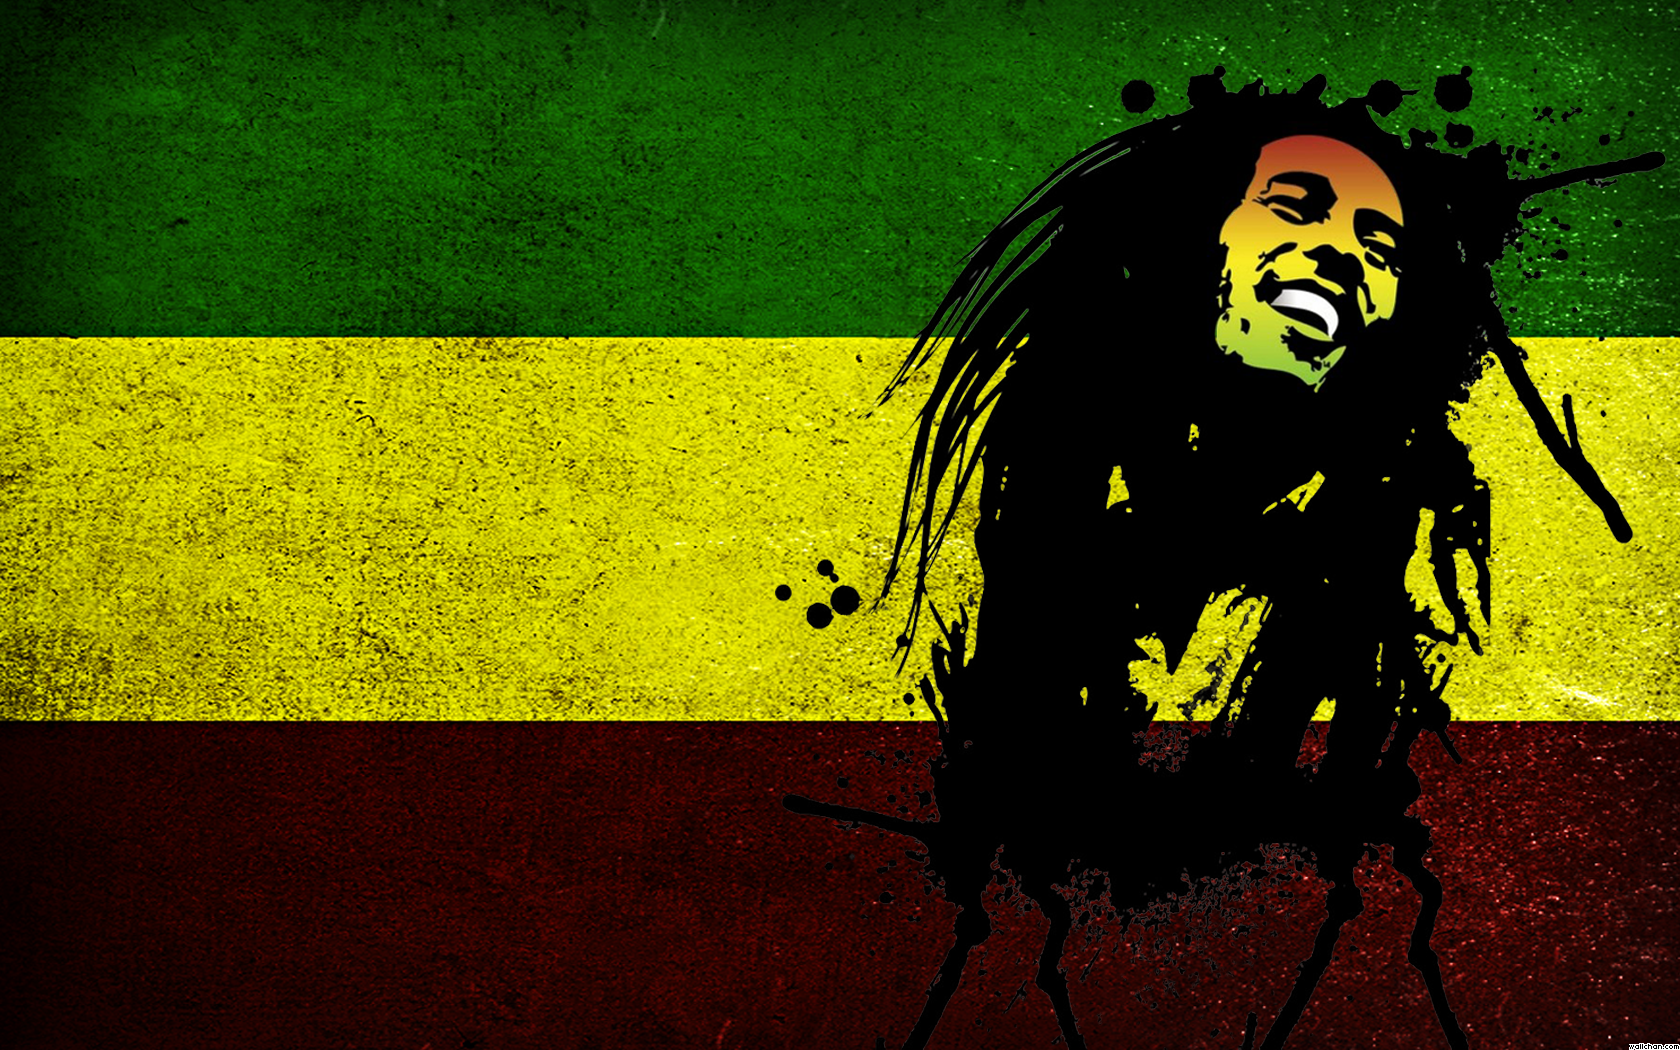 Rasta Lion Hd Wallpaper Hd Wallpapers | Bob Ma...